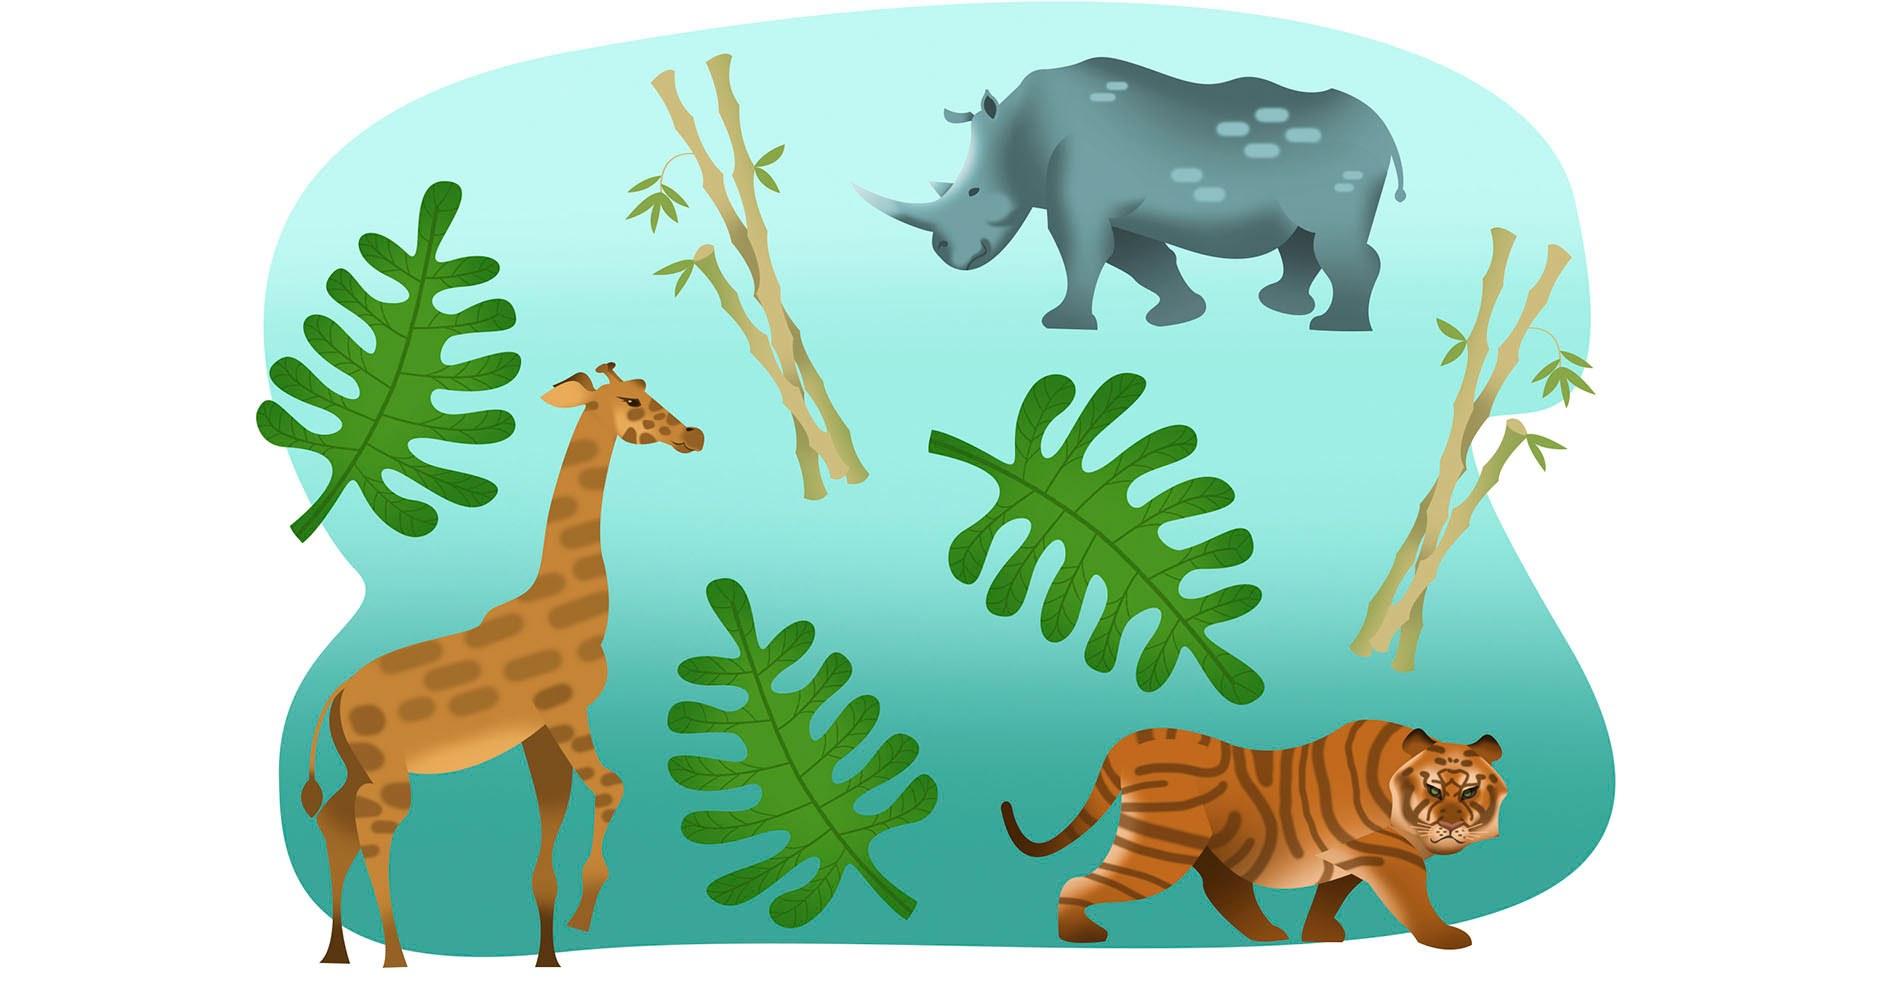 Modern Jungle Animals Collage Concept Wall Art